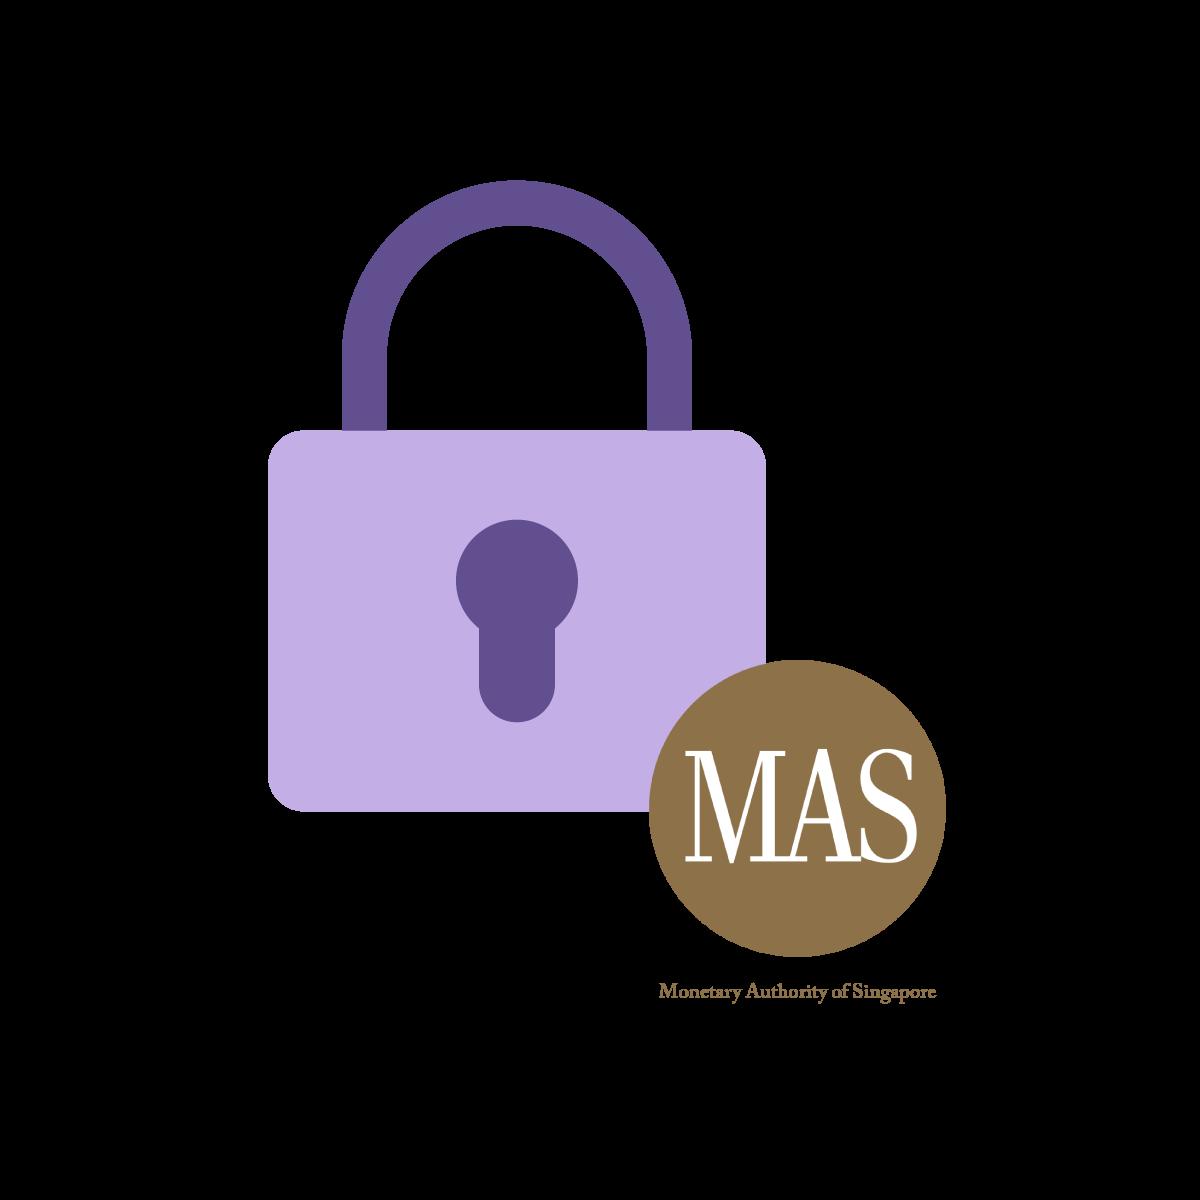 Icon of lock and MAS logo